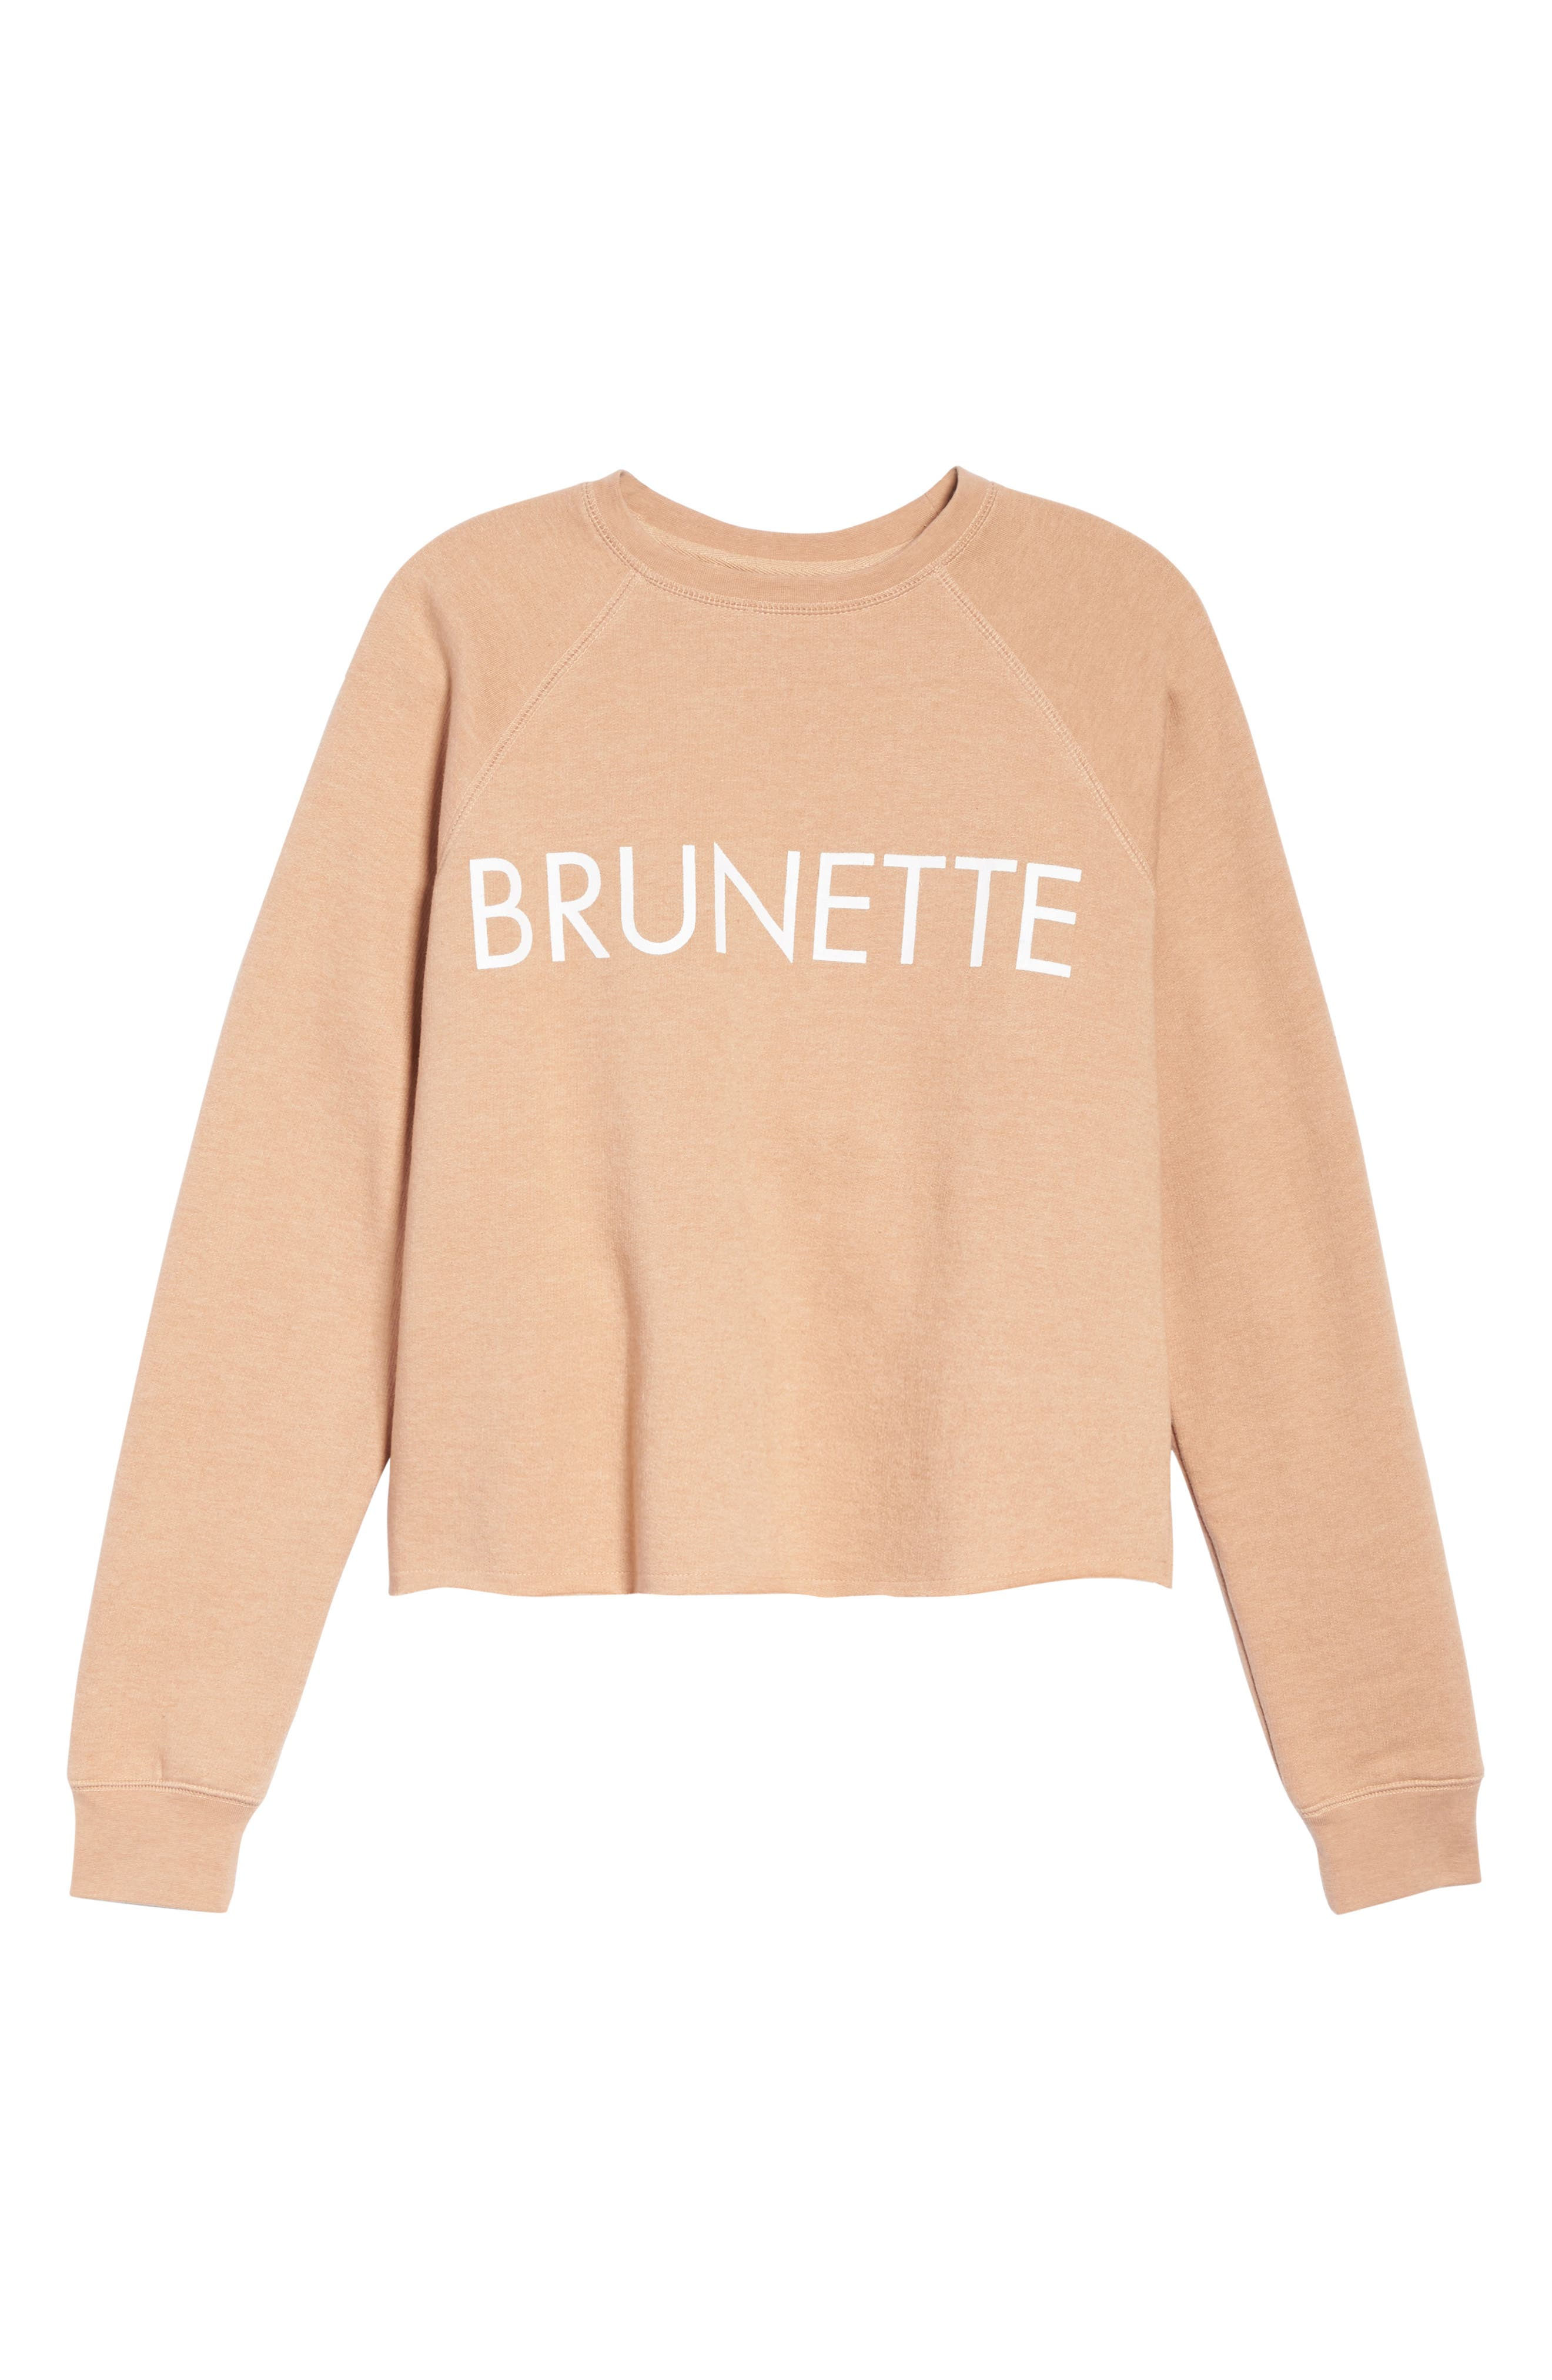 Middle Sister Brunette Sweatshirt,                             Alternate thumbnail 6, color,                             950